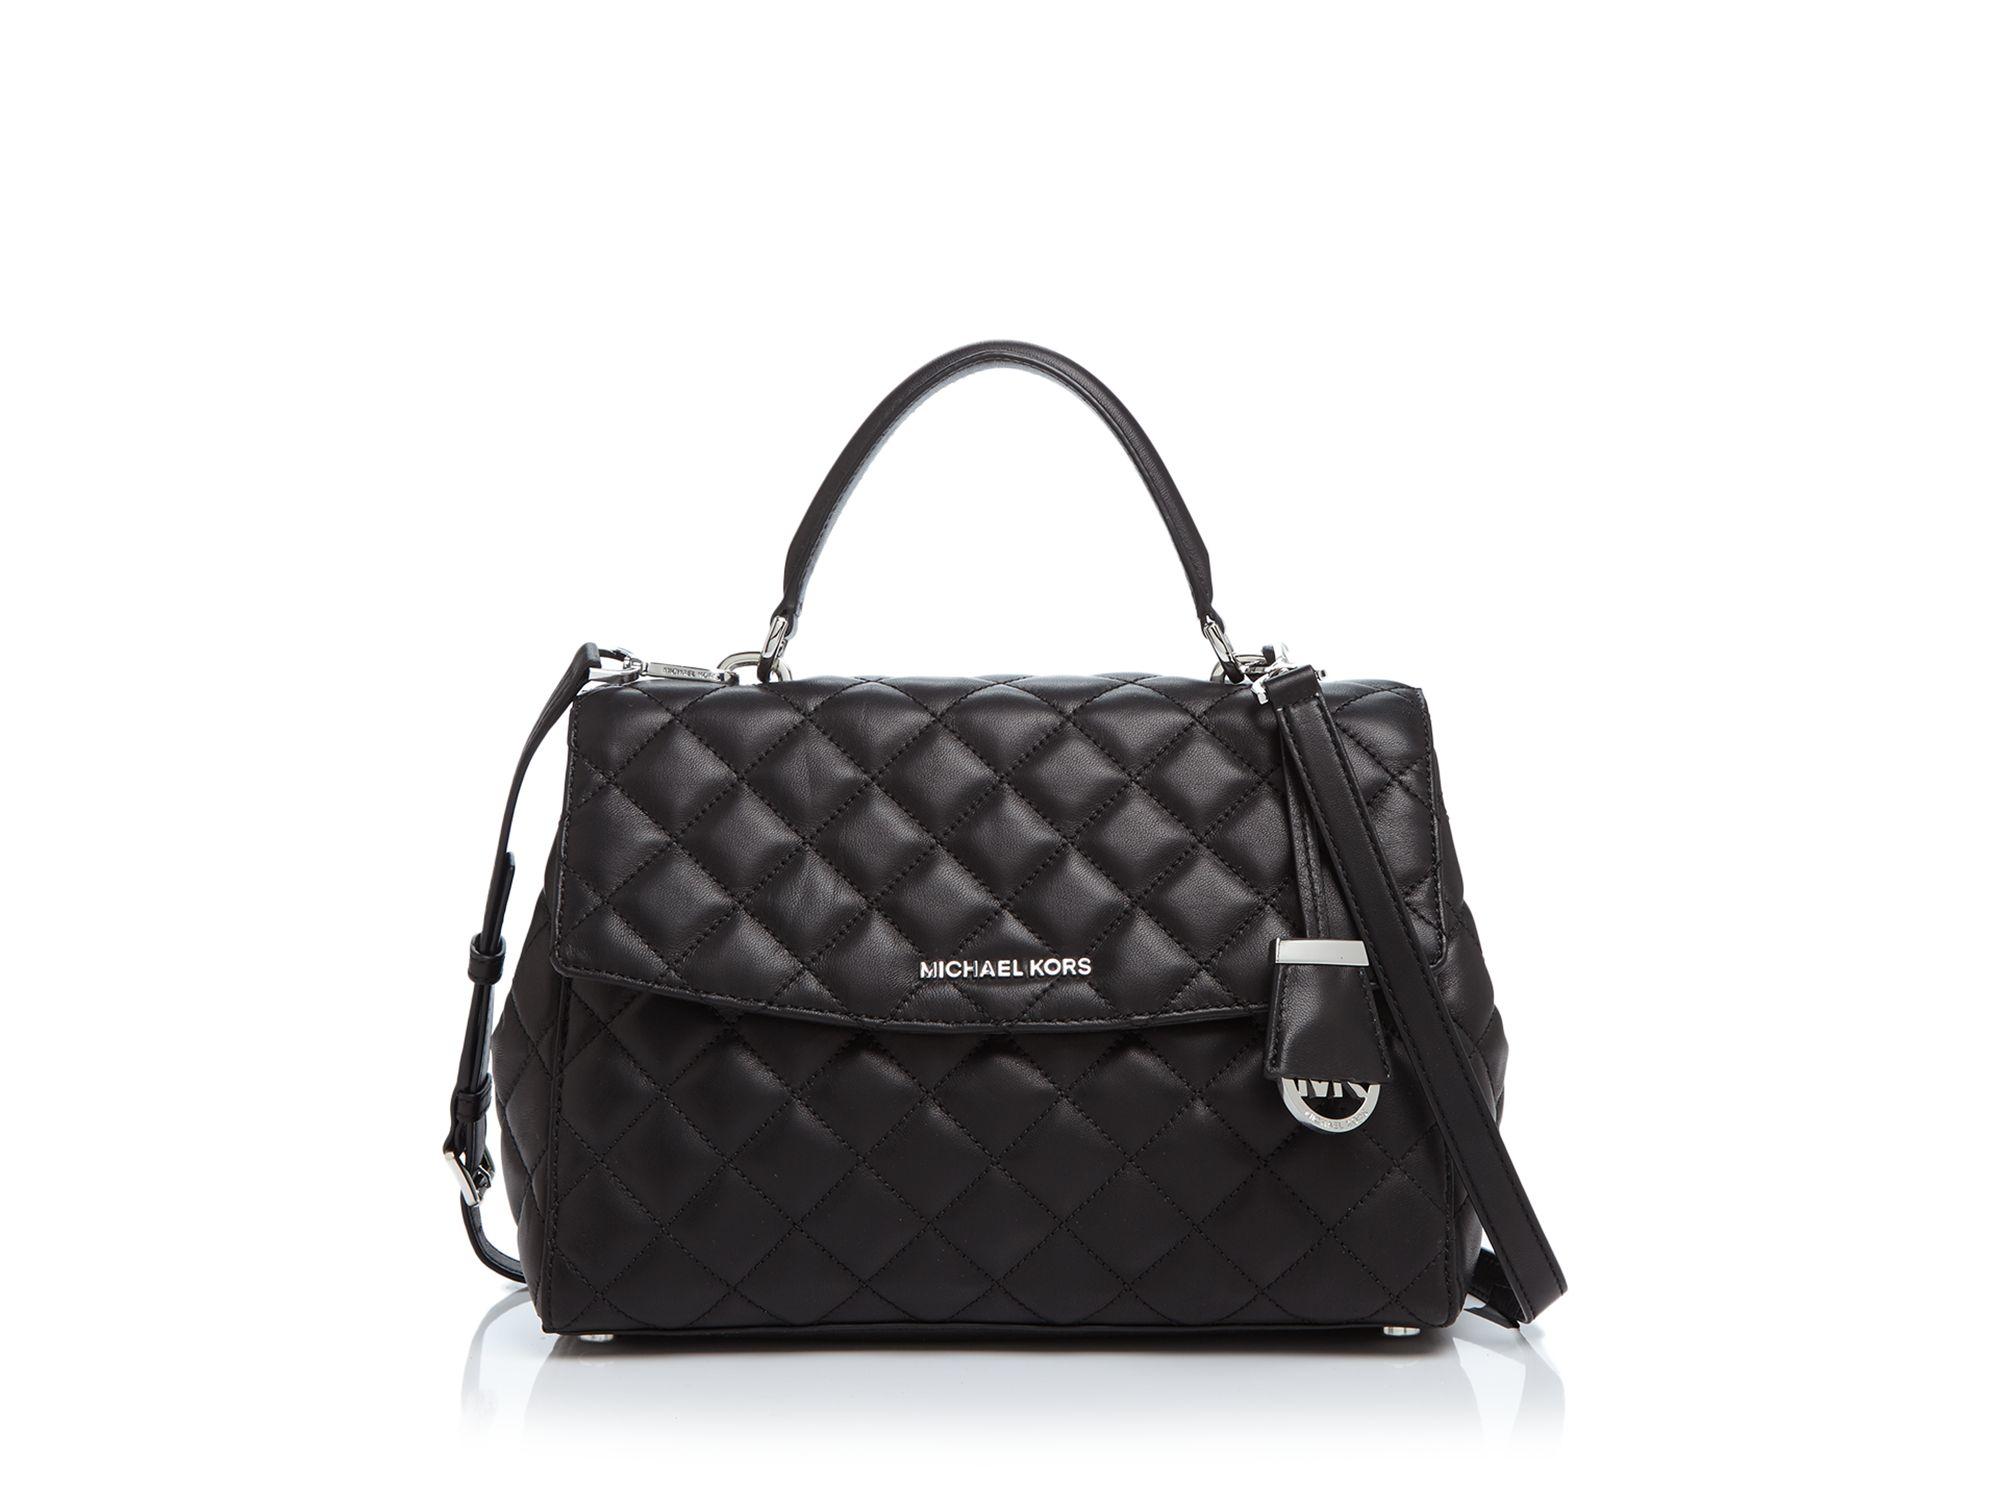 Michael michael kors Medium Quilted Ava Satchel - 100 ... : michael kors black quilted handbag - Adamdwight.com